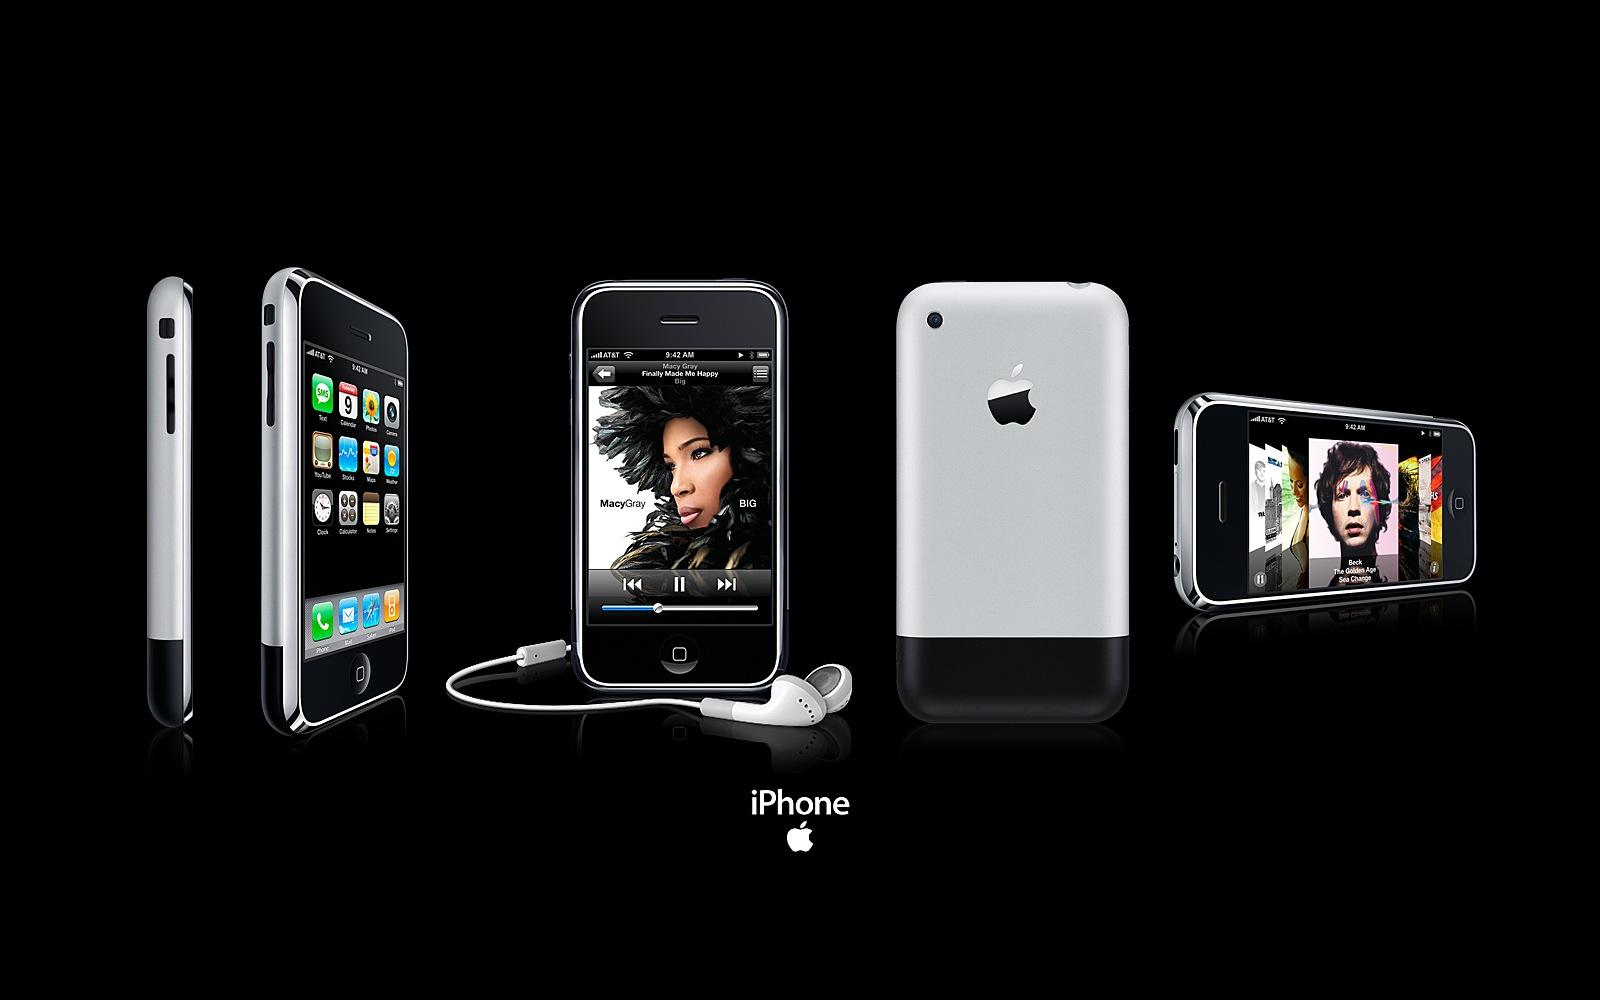 Iphonehacks Iphone X Wallpaper Iphone Wallpapers Iphone Themes Iphone Ringtones Iphone